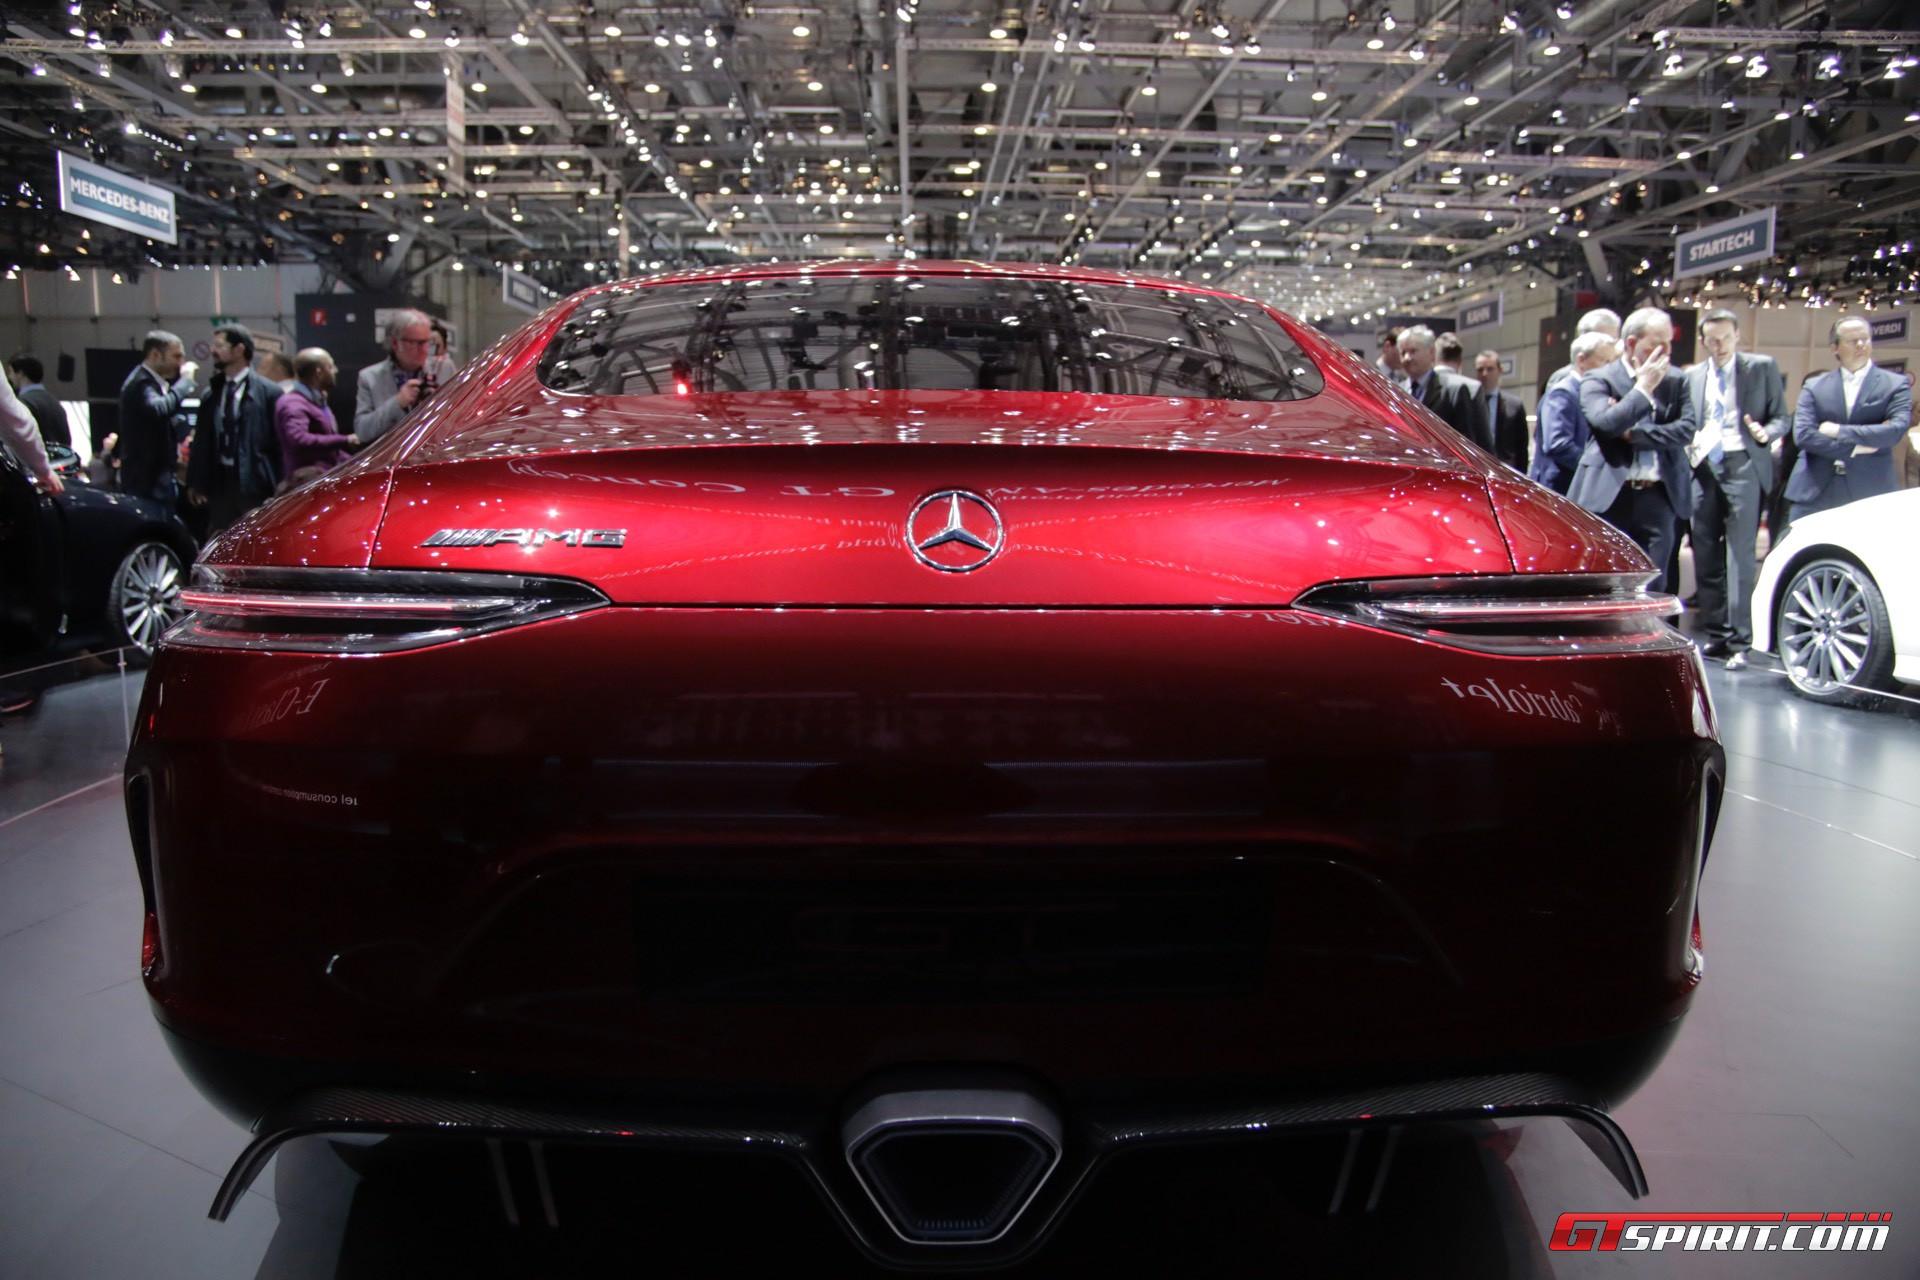 https://storage.googleapis.com/gtspirit/uploads/2017/03/Mercedes-AMG-GT-Concept-at-Geneva-20178.jpg